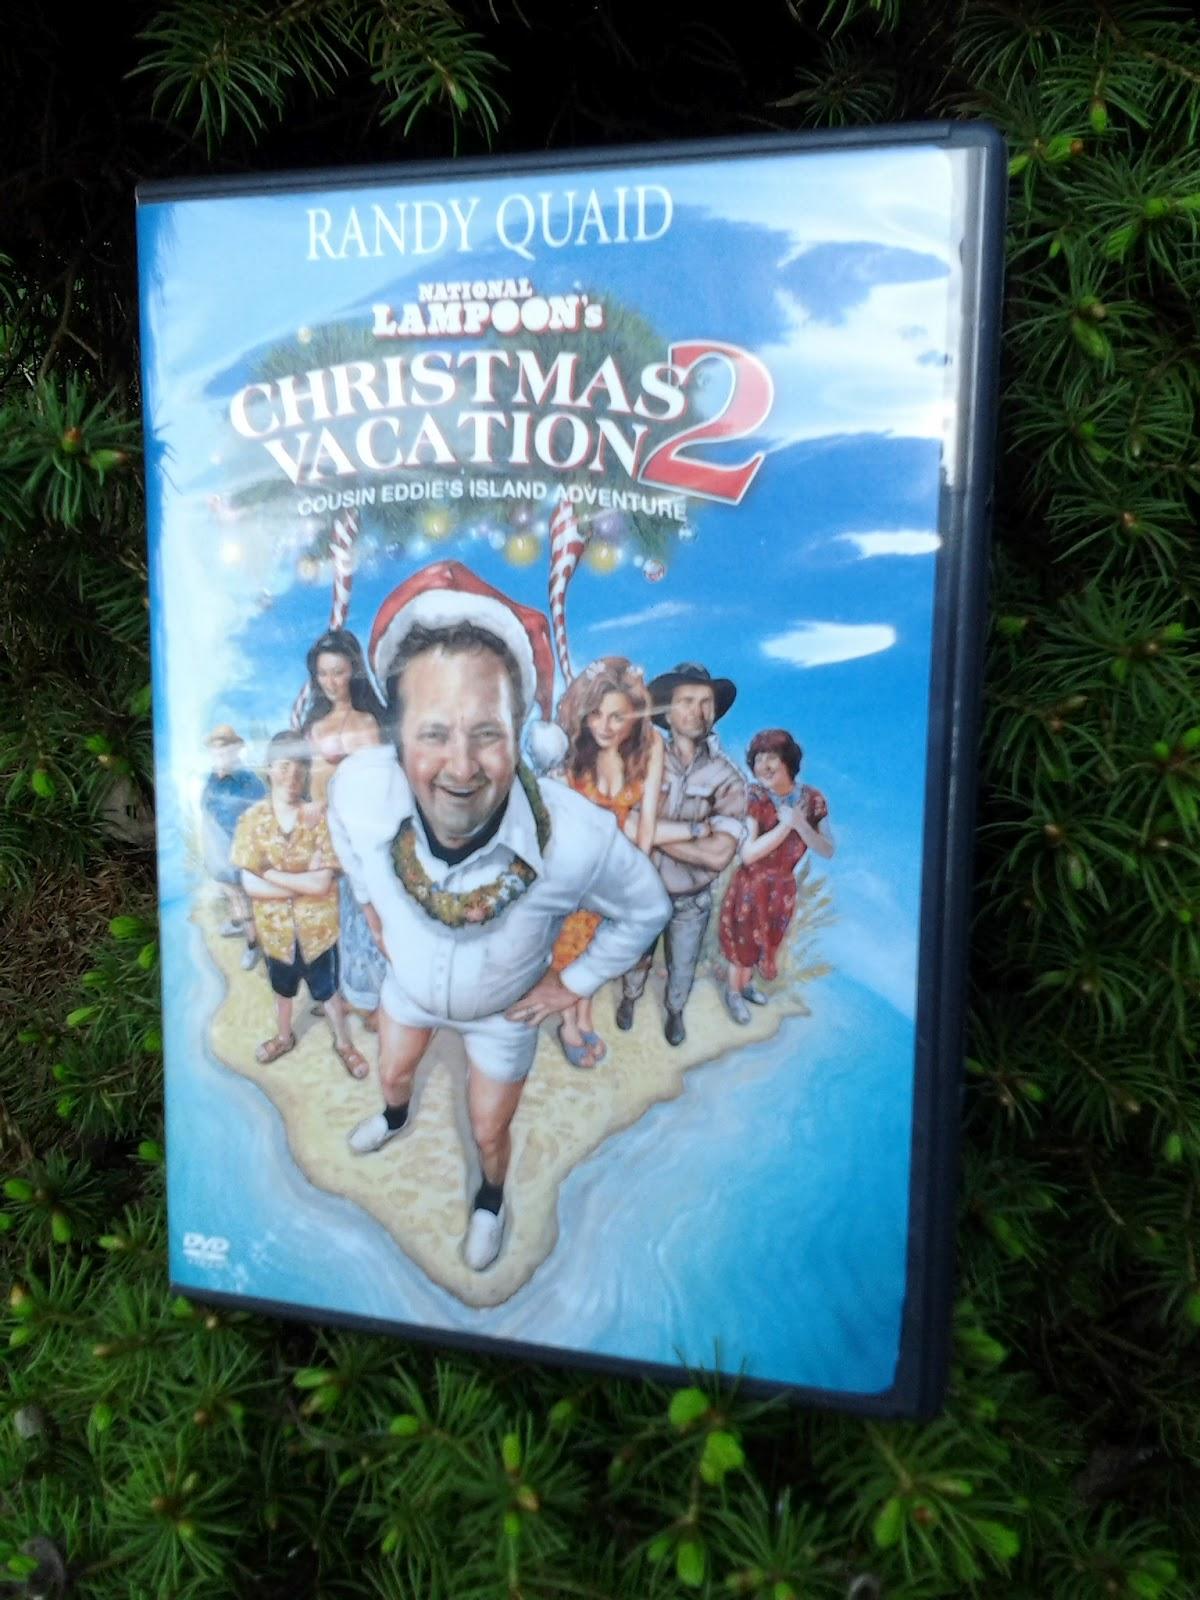 Cousin Eddie Christmas Vacation Quotes. QuotesGram